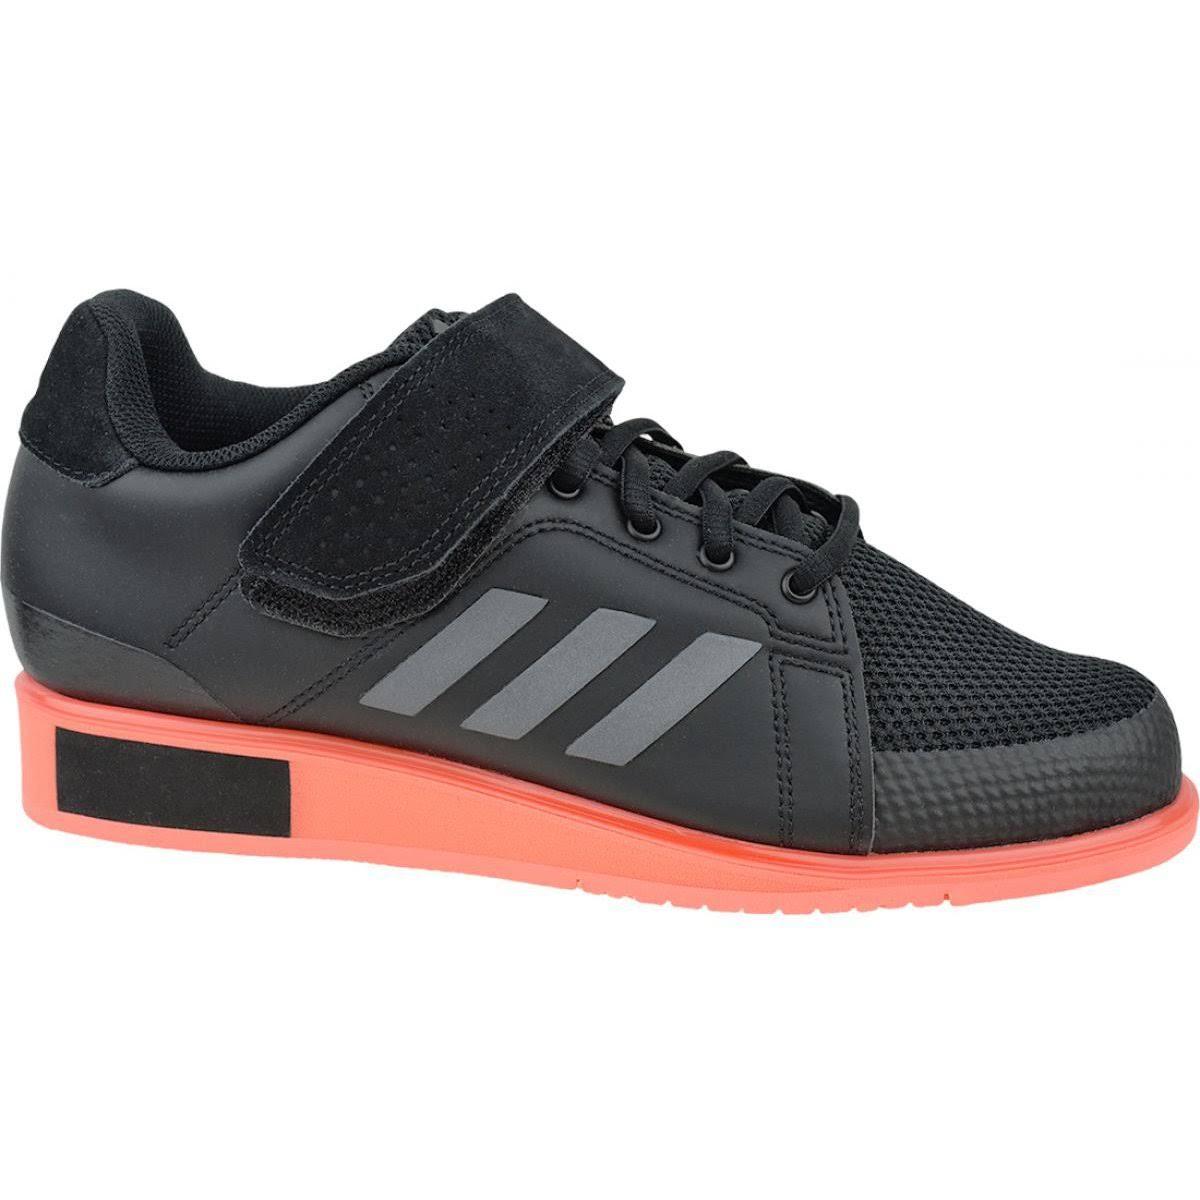 Adidas Power Perfect 3 M EF2985 Shoes Black